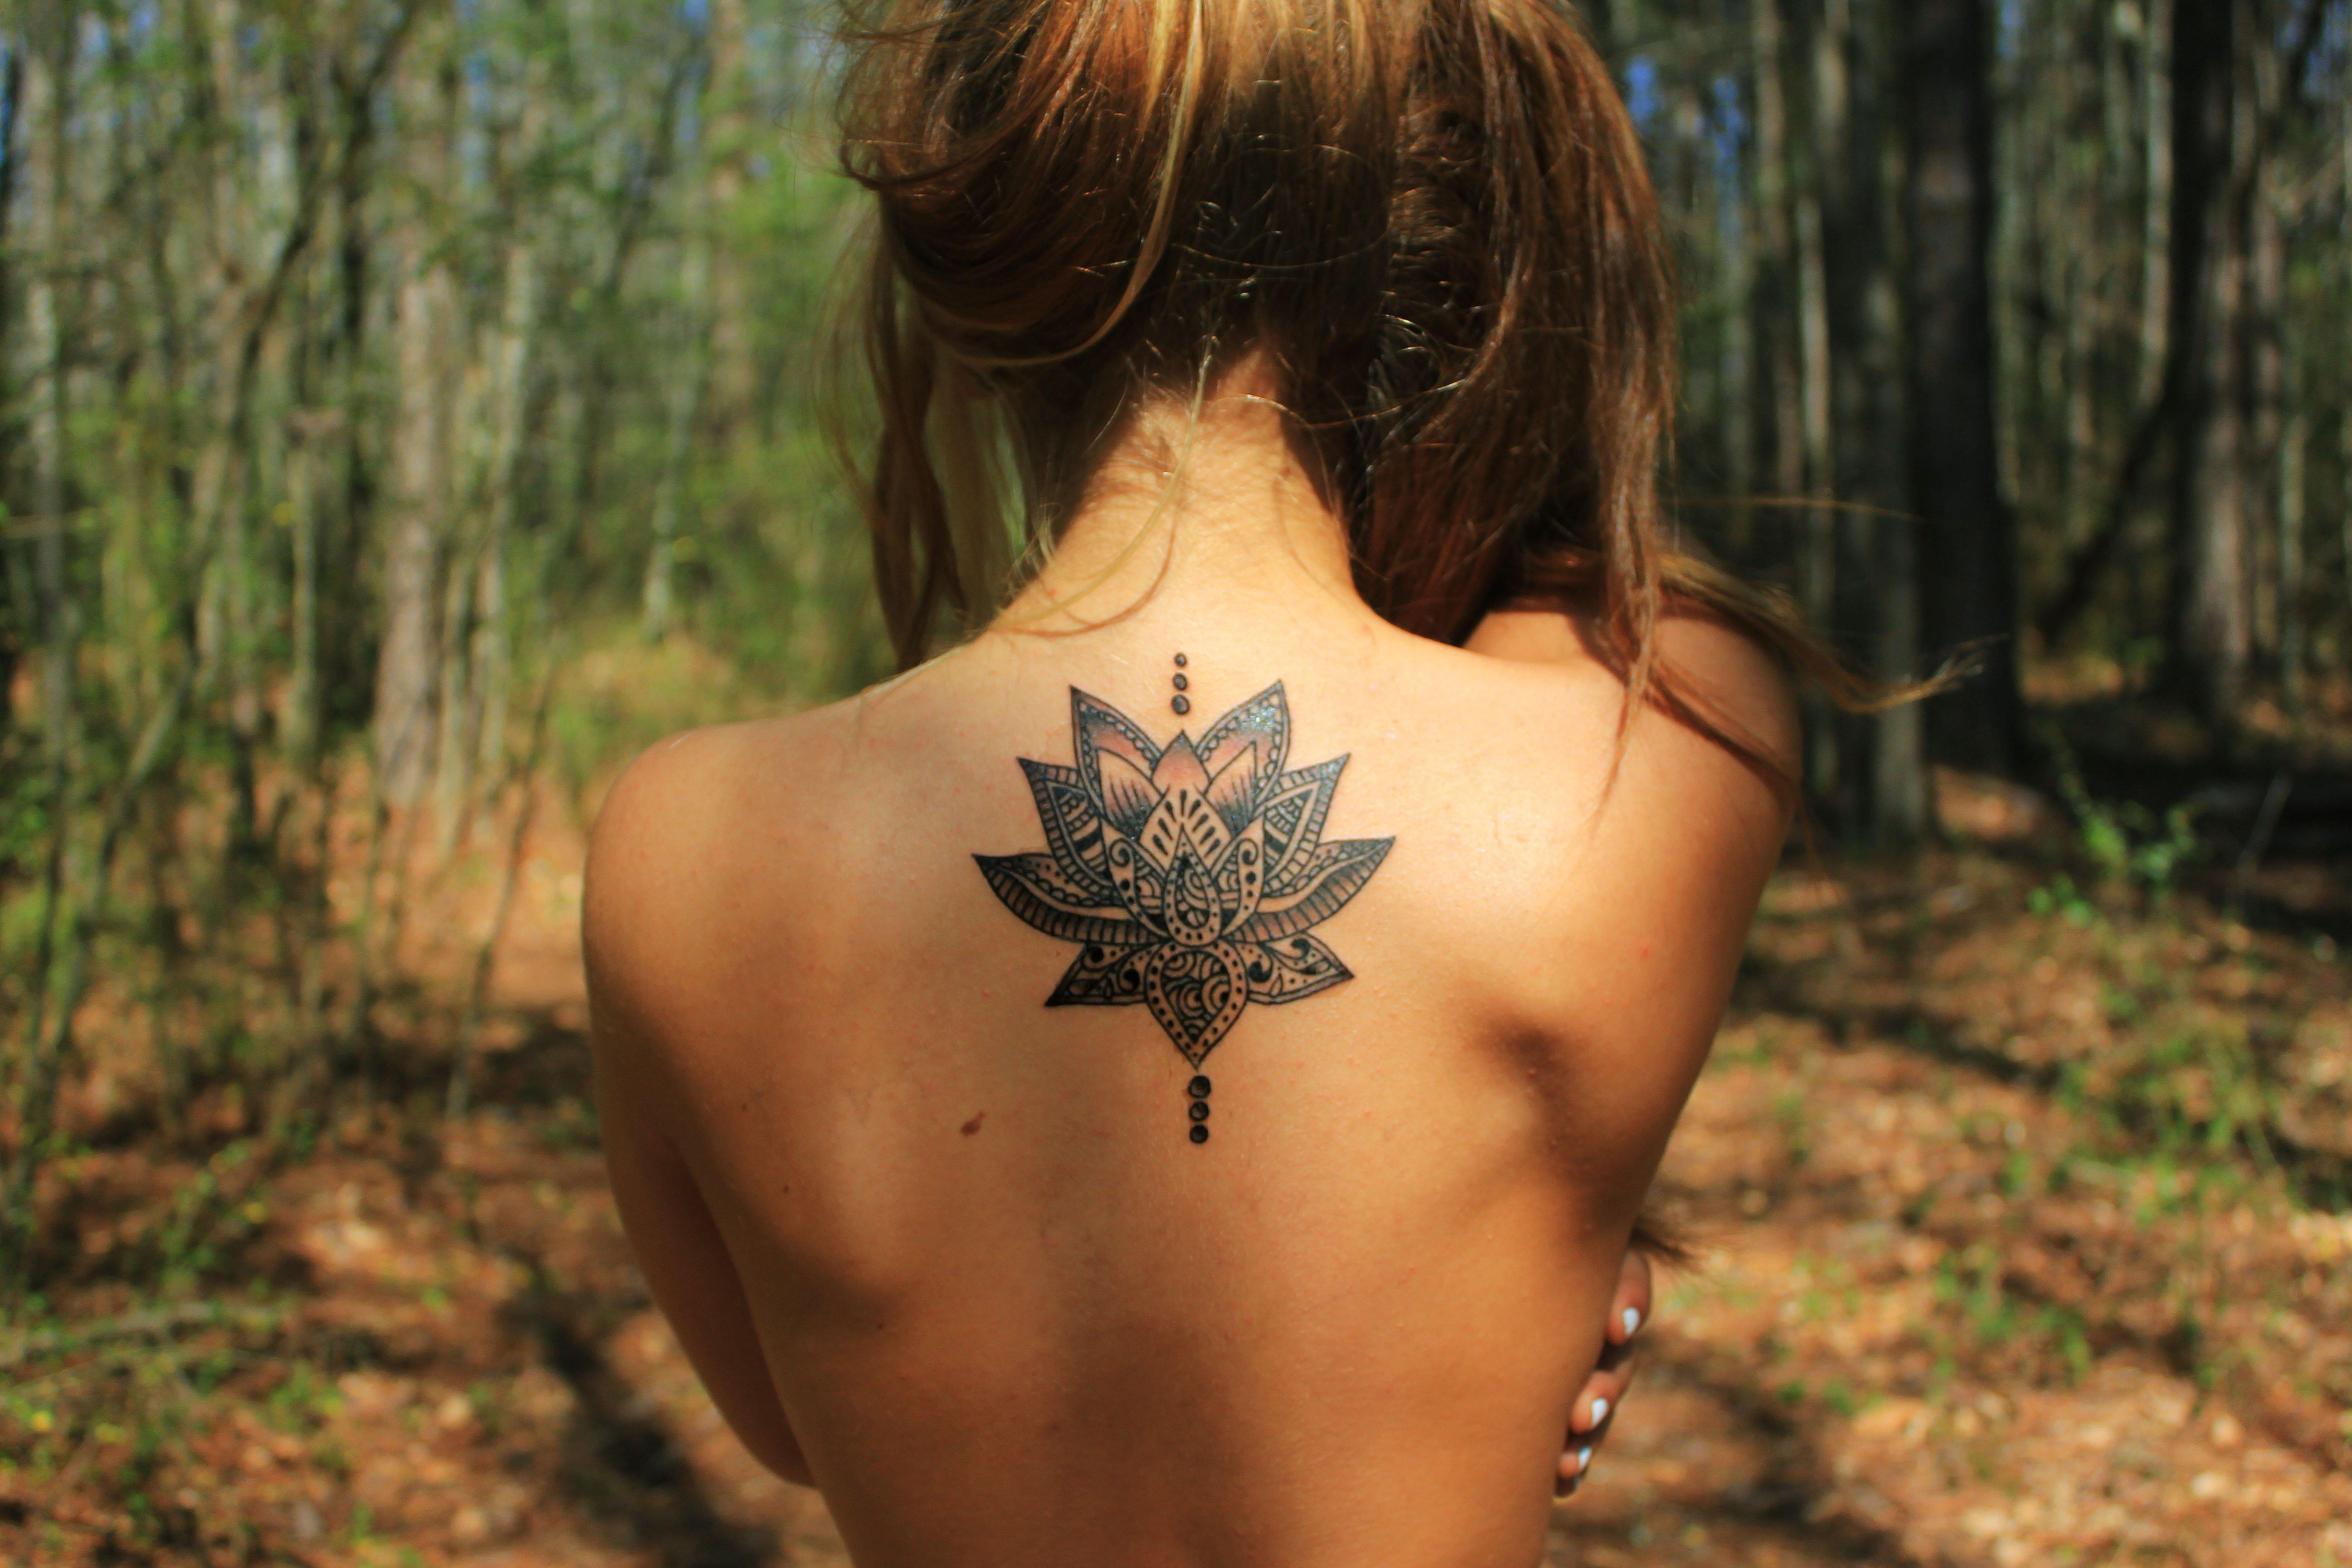 Significado De Flor De Loto Tatuaje